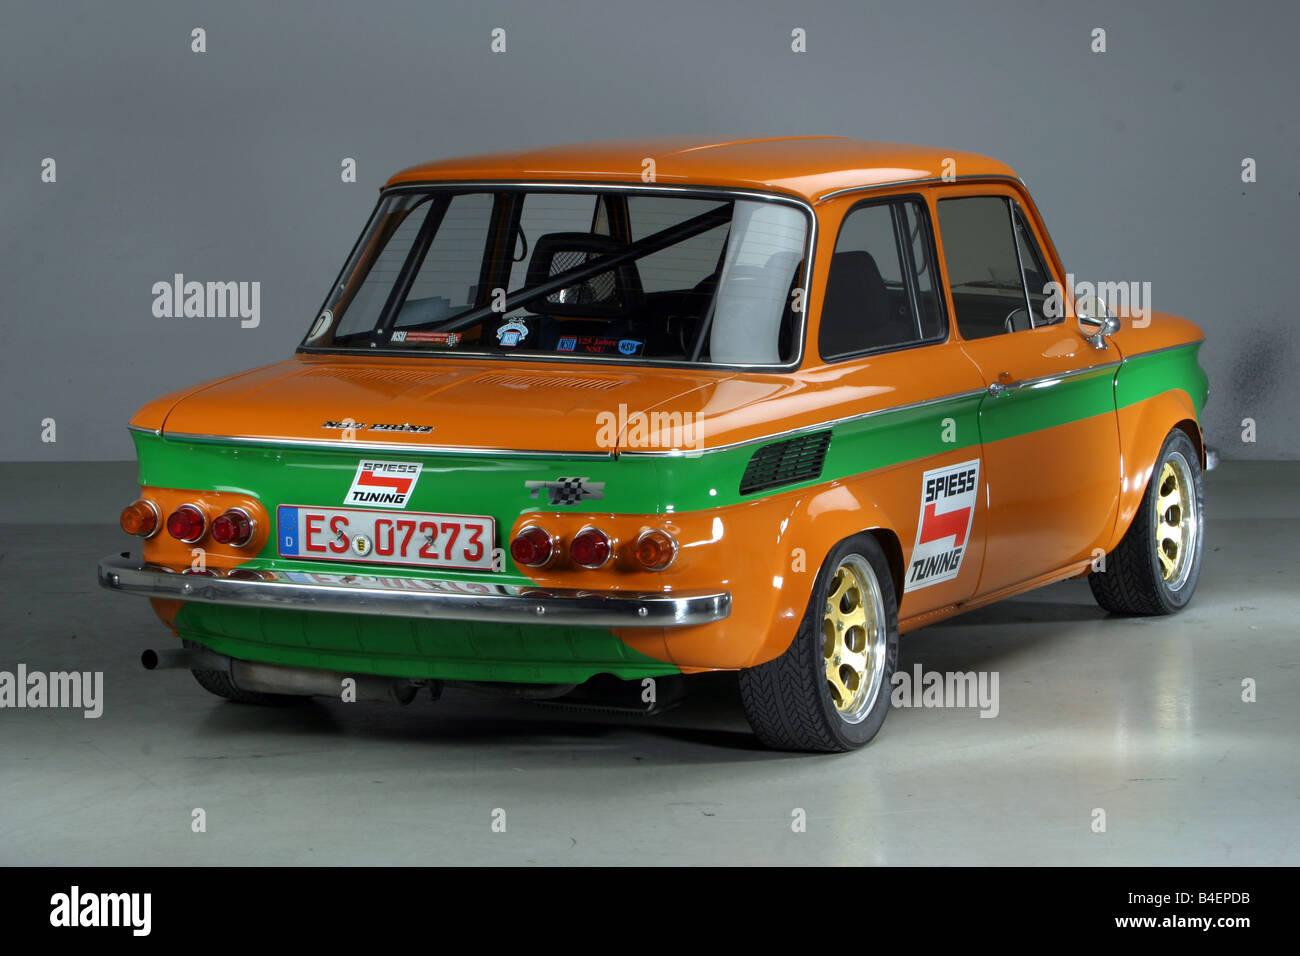 auto nsu prinz baujahr ca 1967 1971 orange oldtimer. Black Bedroom Furniture Sets. Home Design Ideas